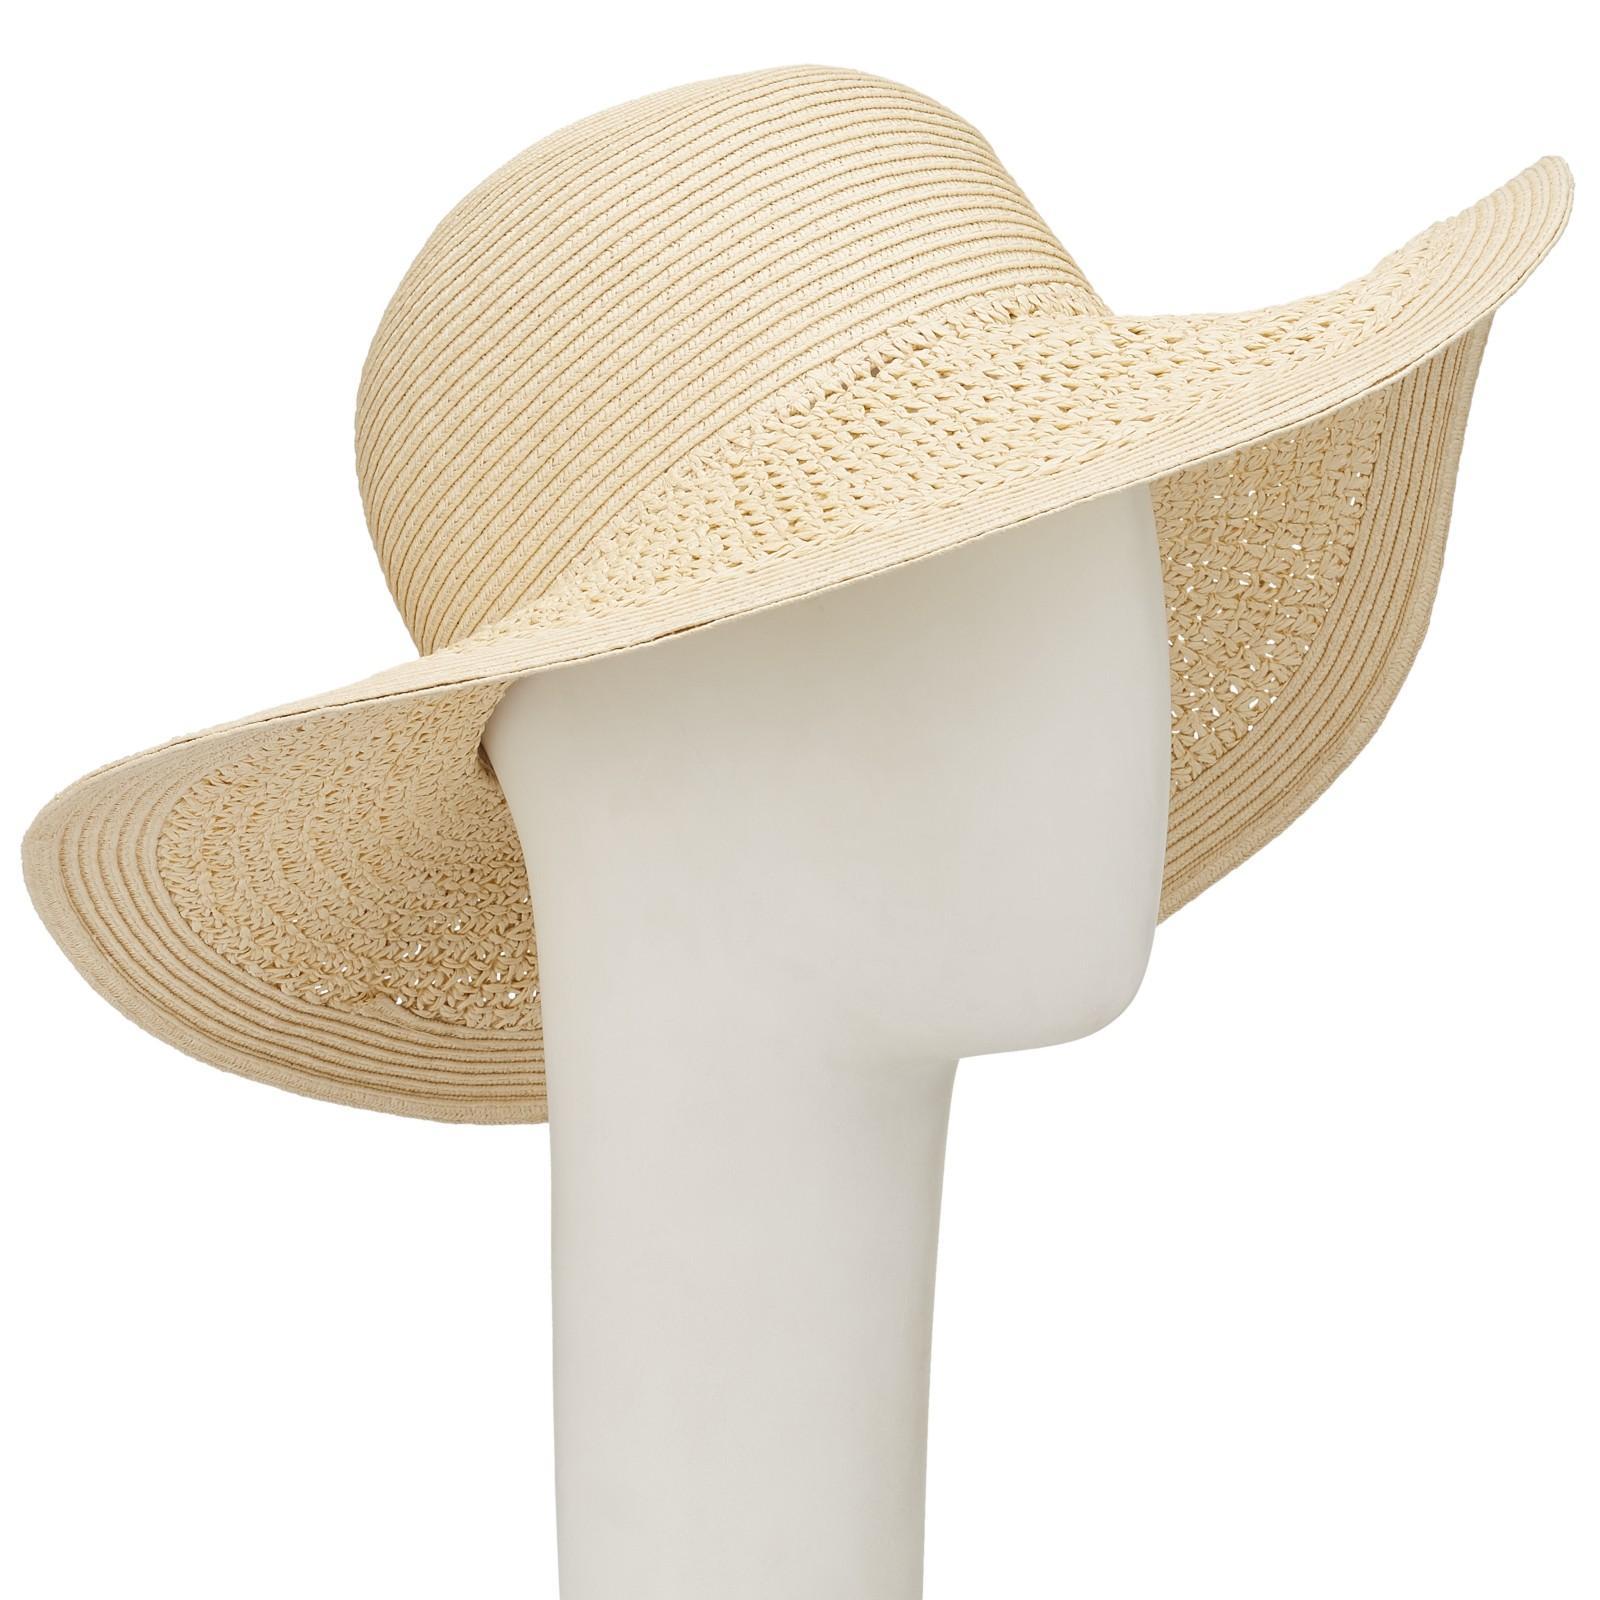 1e8cef517d2 John Lewis Packable Weave Mix Floppy Sun Hat in Natural - Lyst